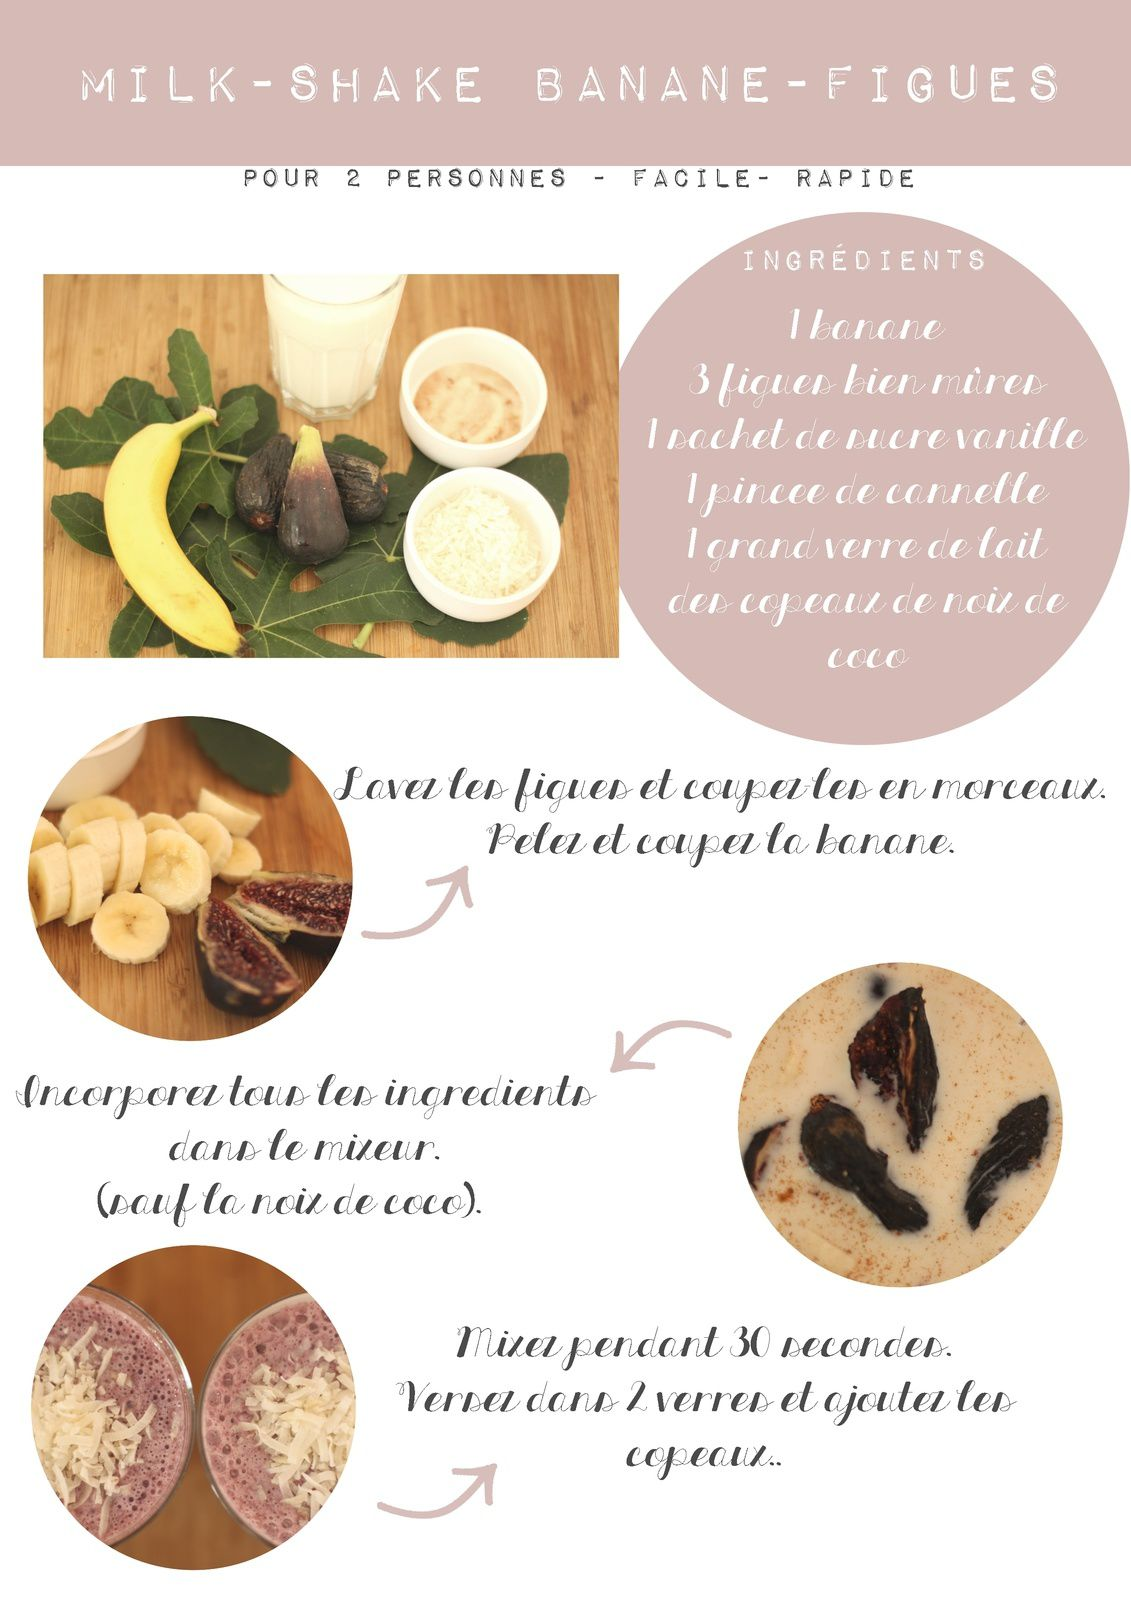 Les estivales : milk-shake banane-figue